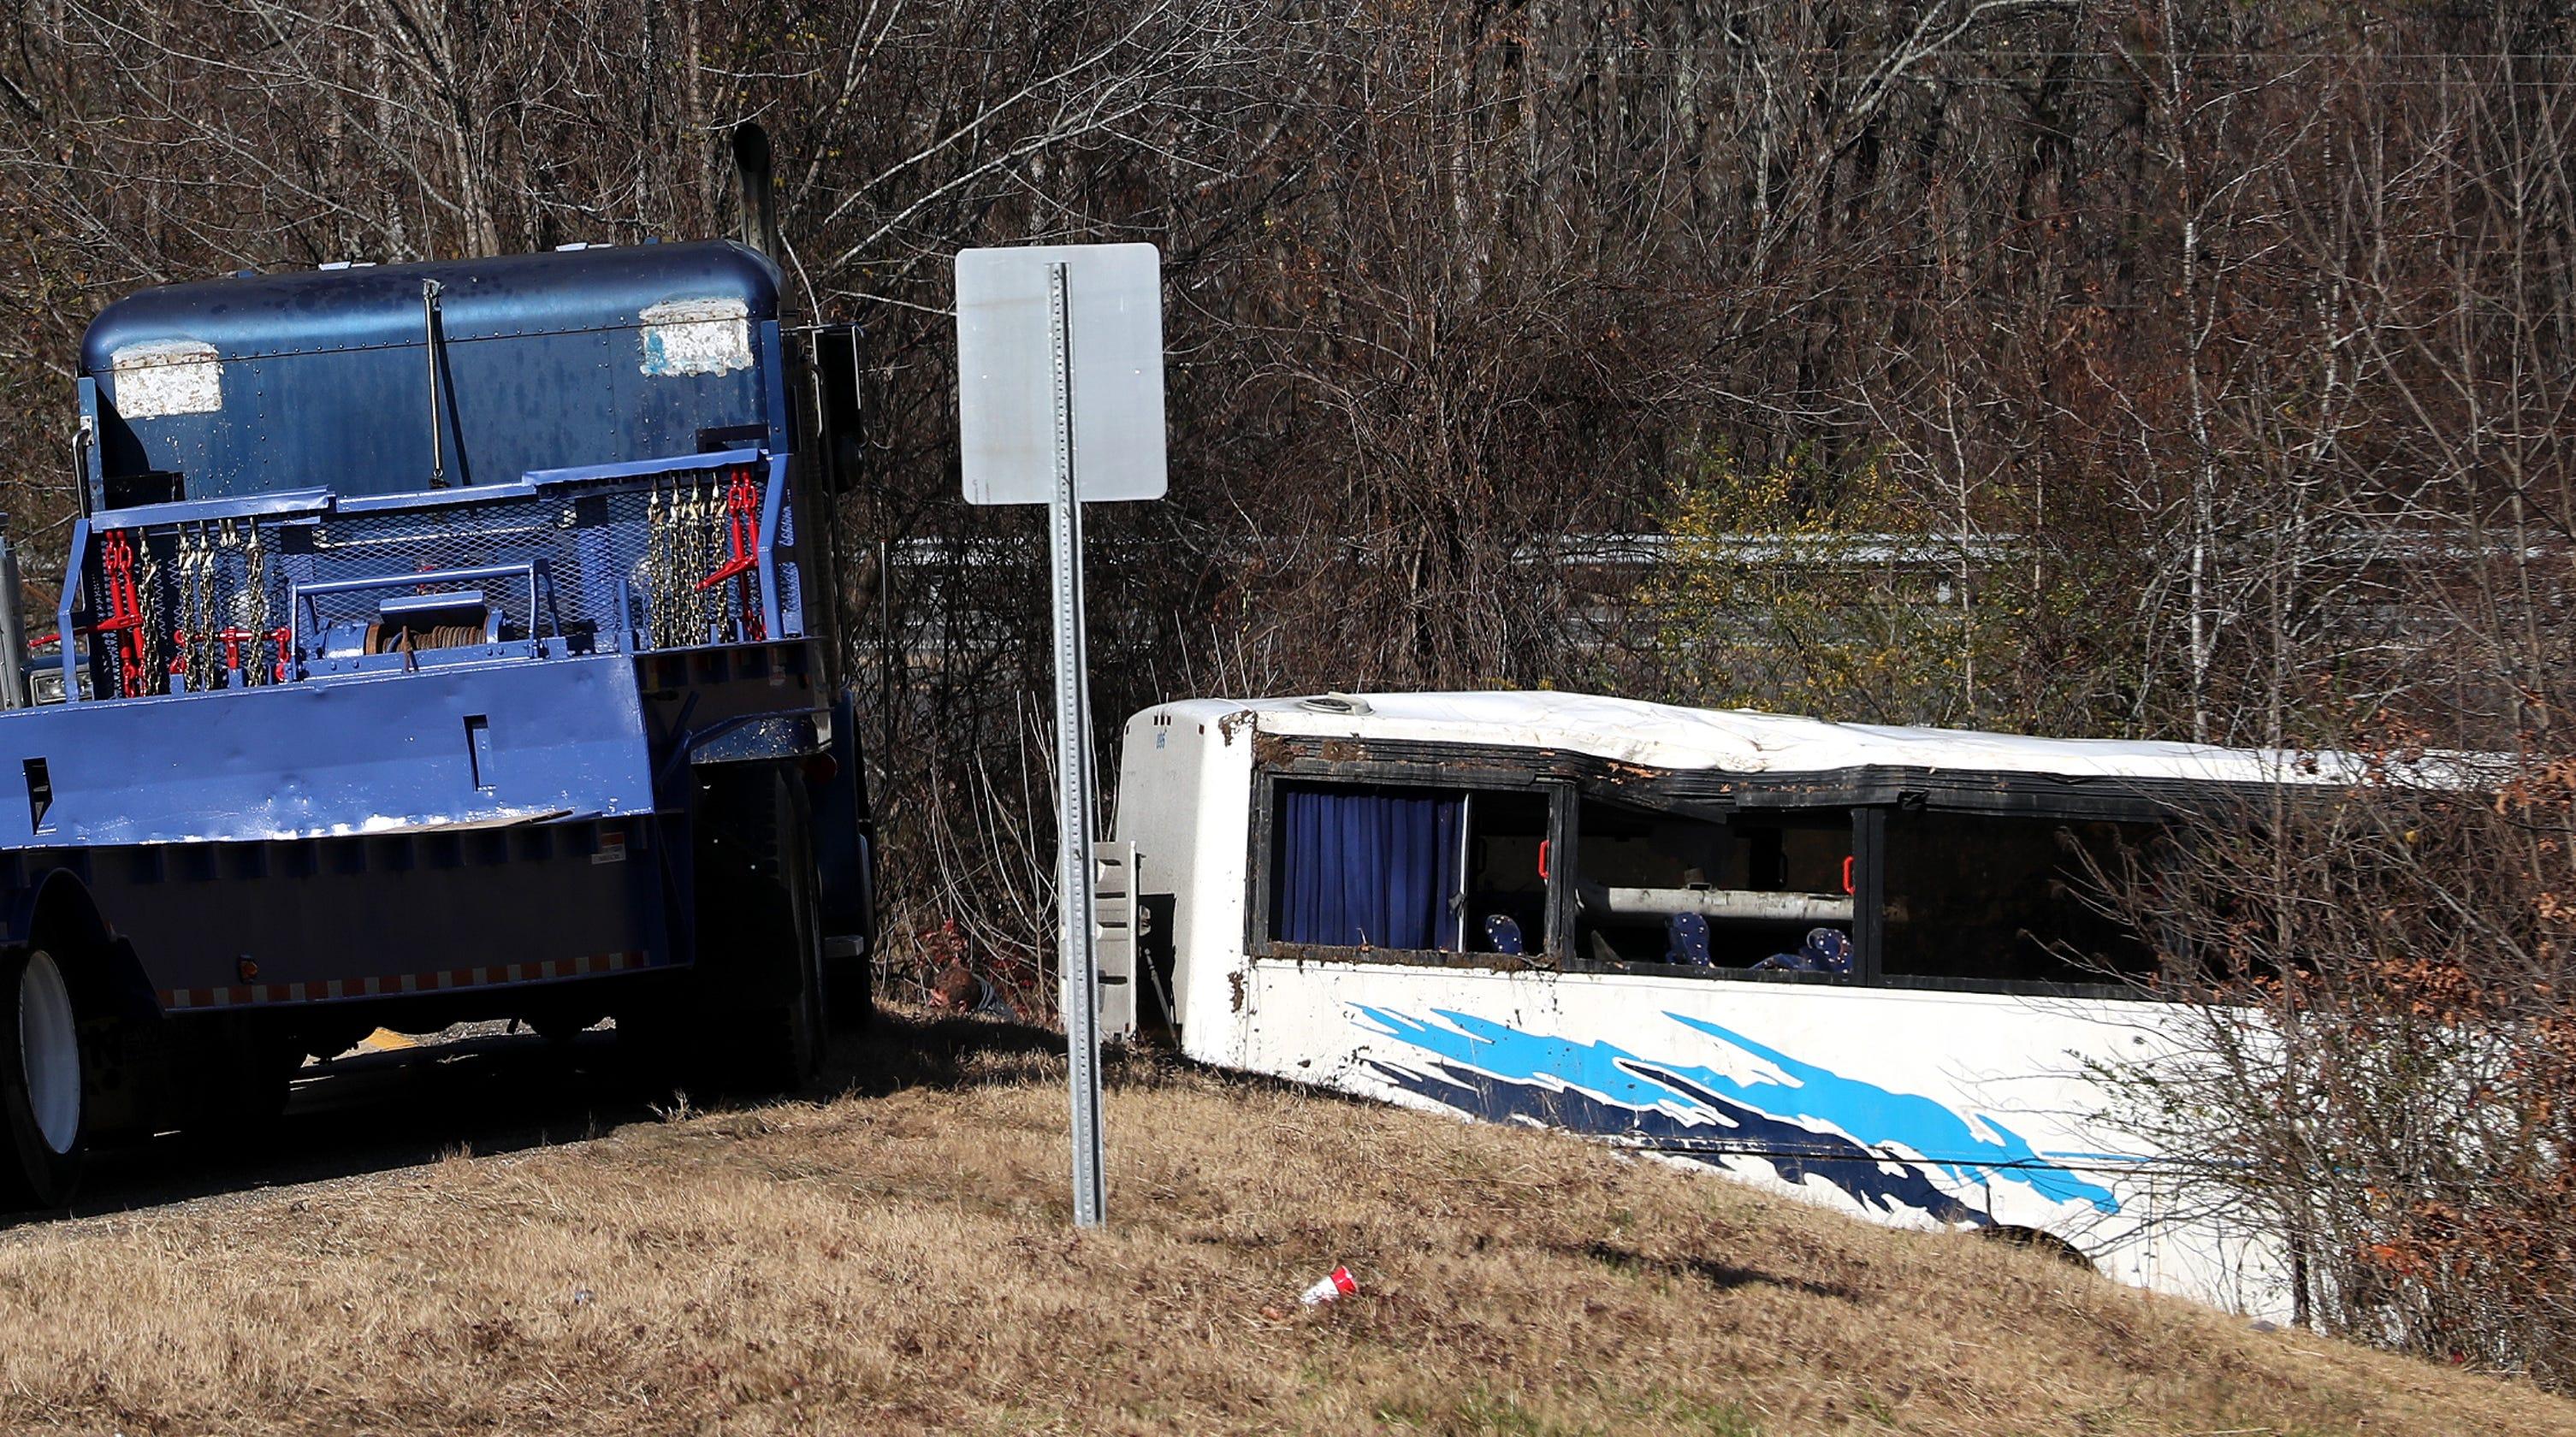 Arkansas bus crash: What we know about the Memphis football team crash